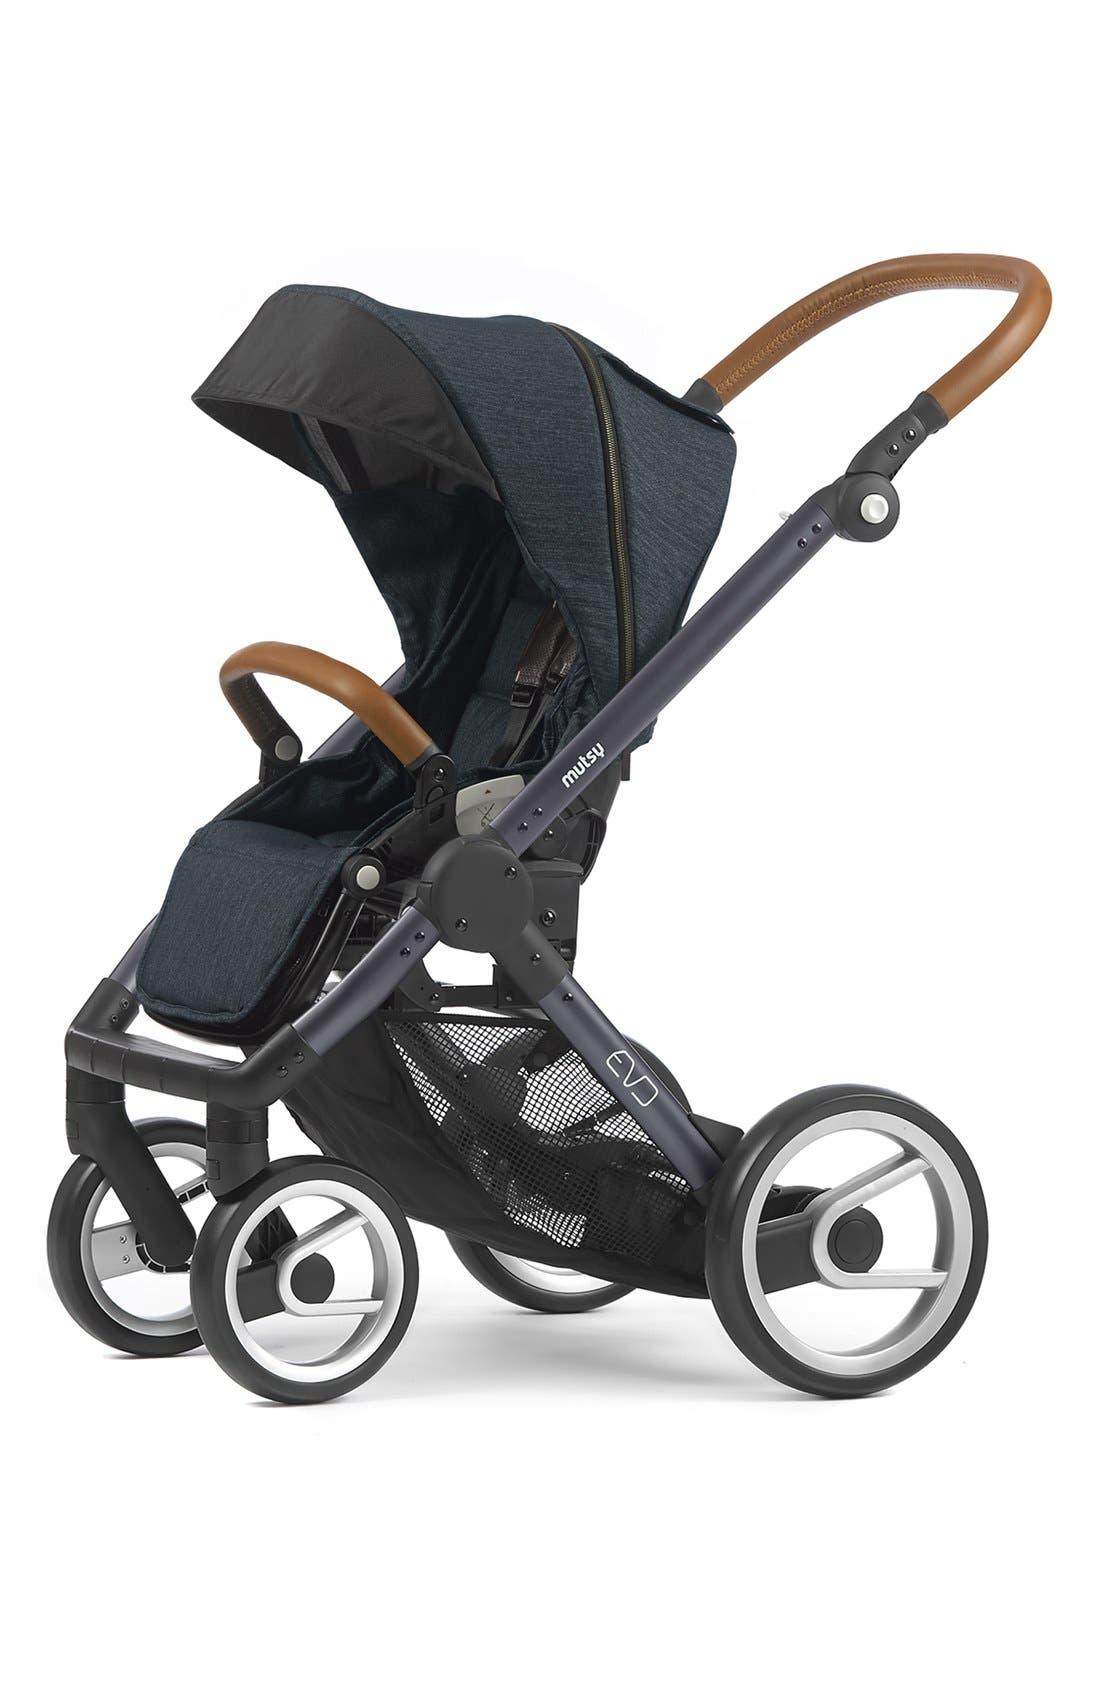 Alternate Image 1 Selected - Mutsy 'Evo - Industrial' Stroller